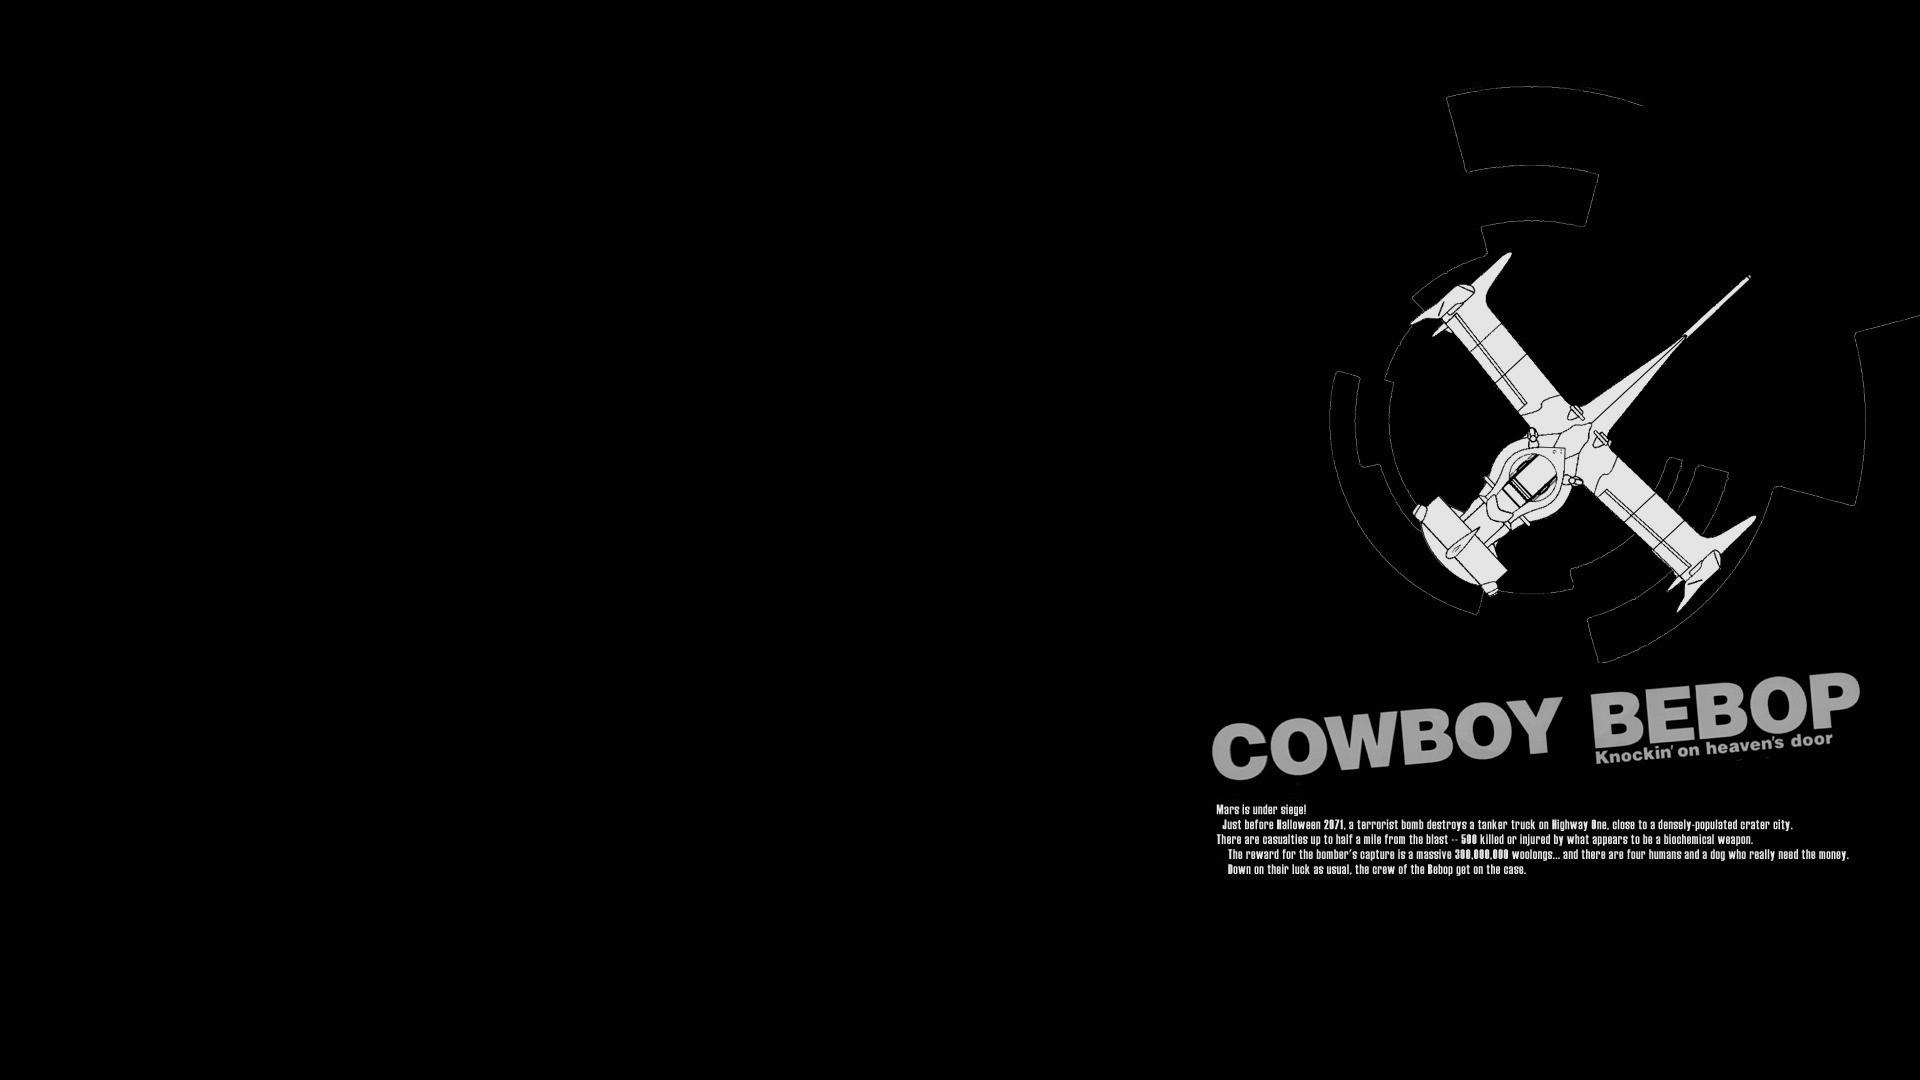 Cowboy Bebop Wallpapers HD Download 1920x1080